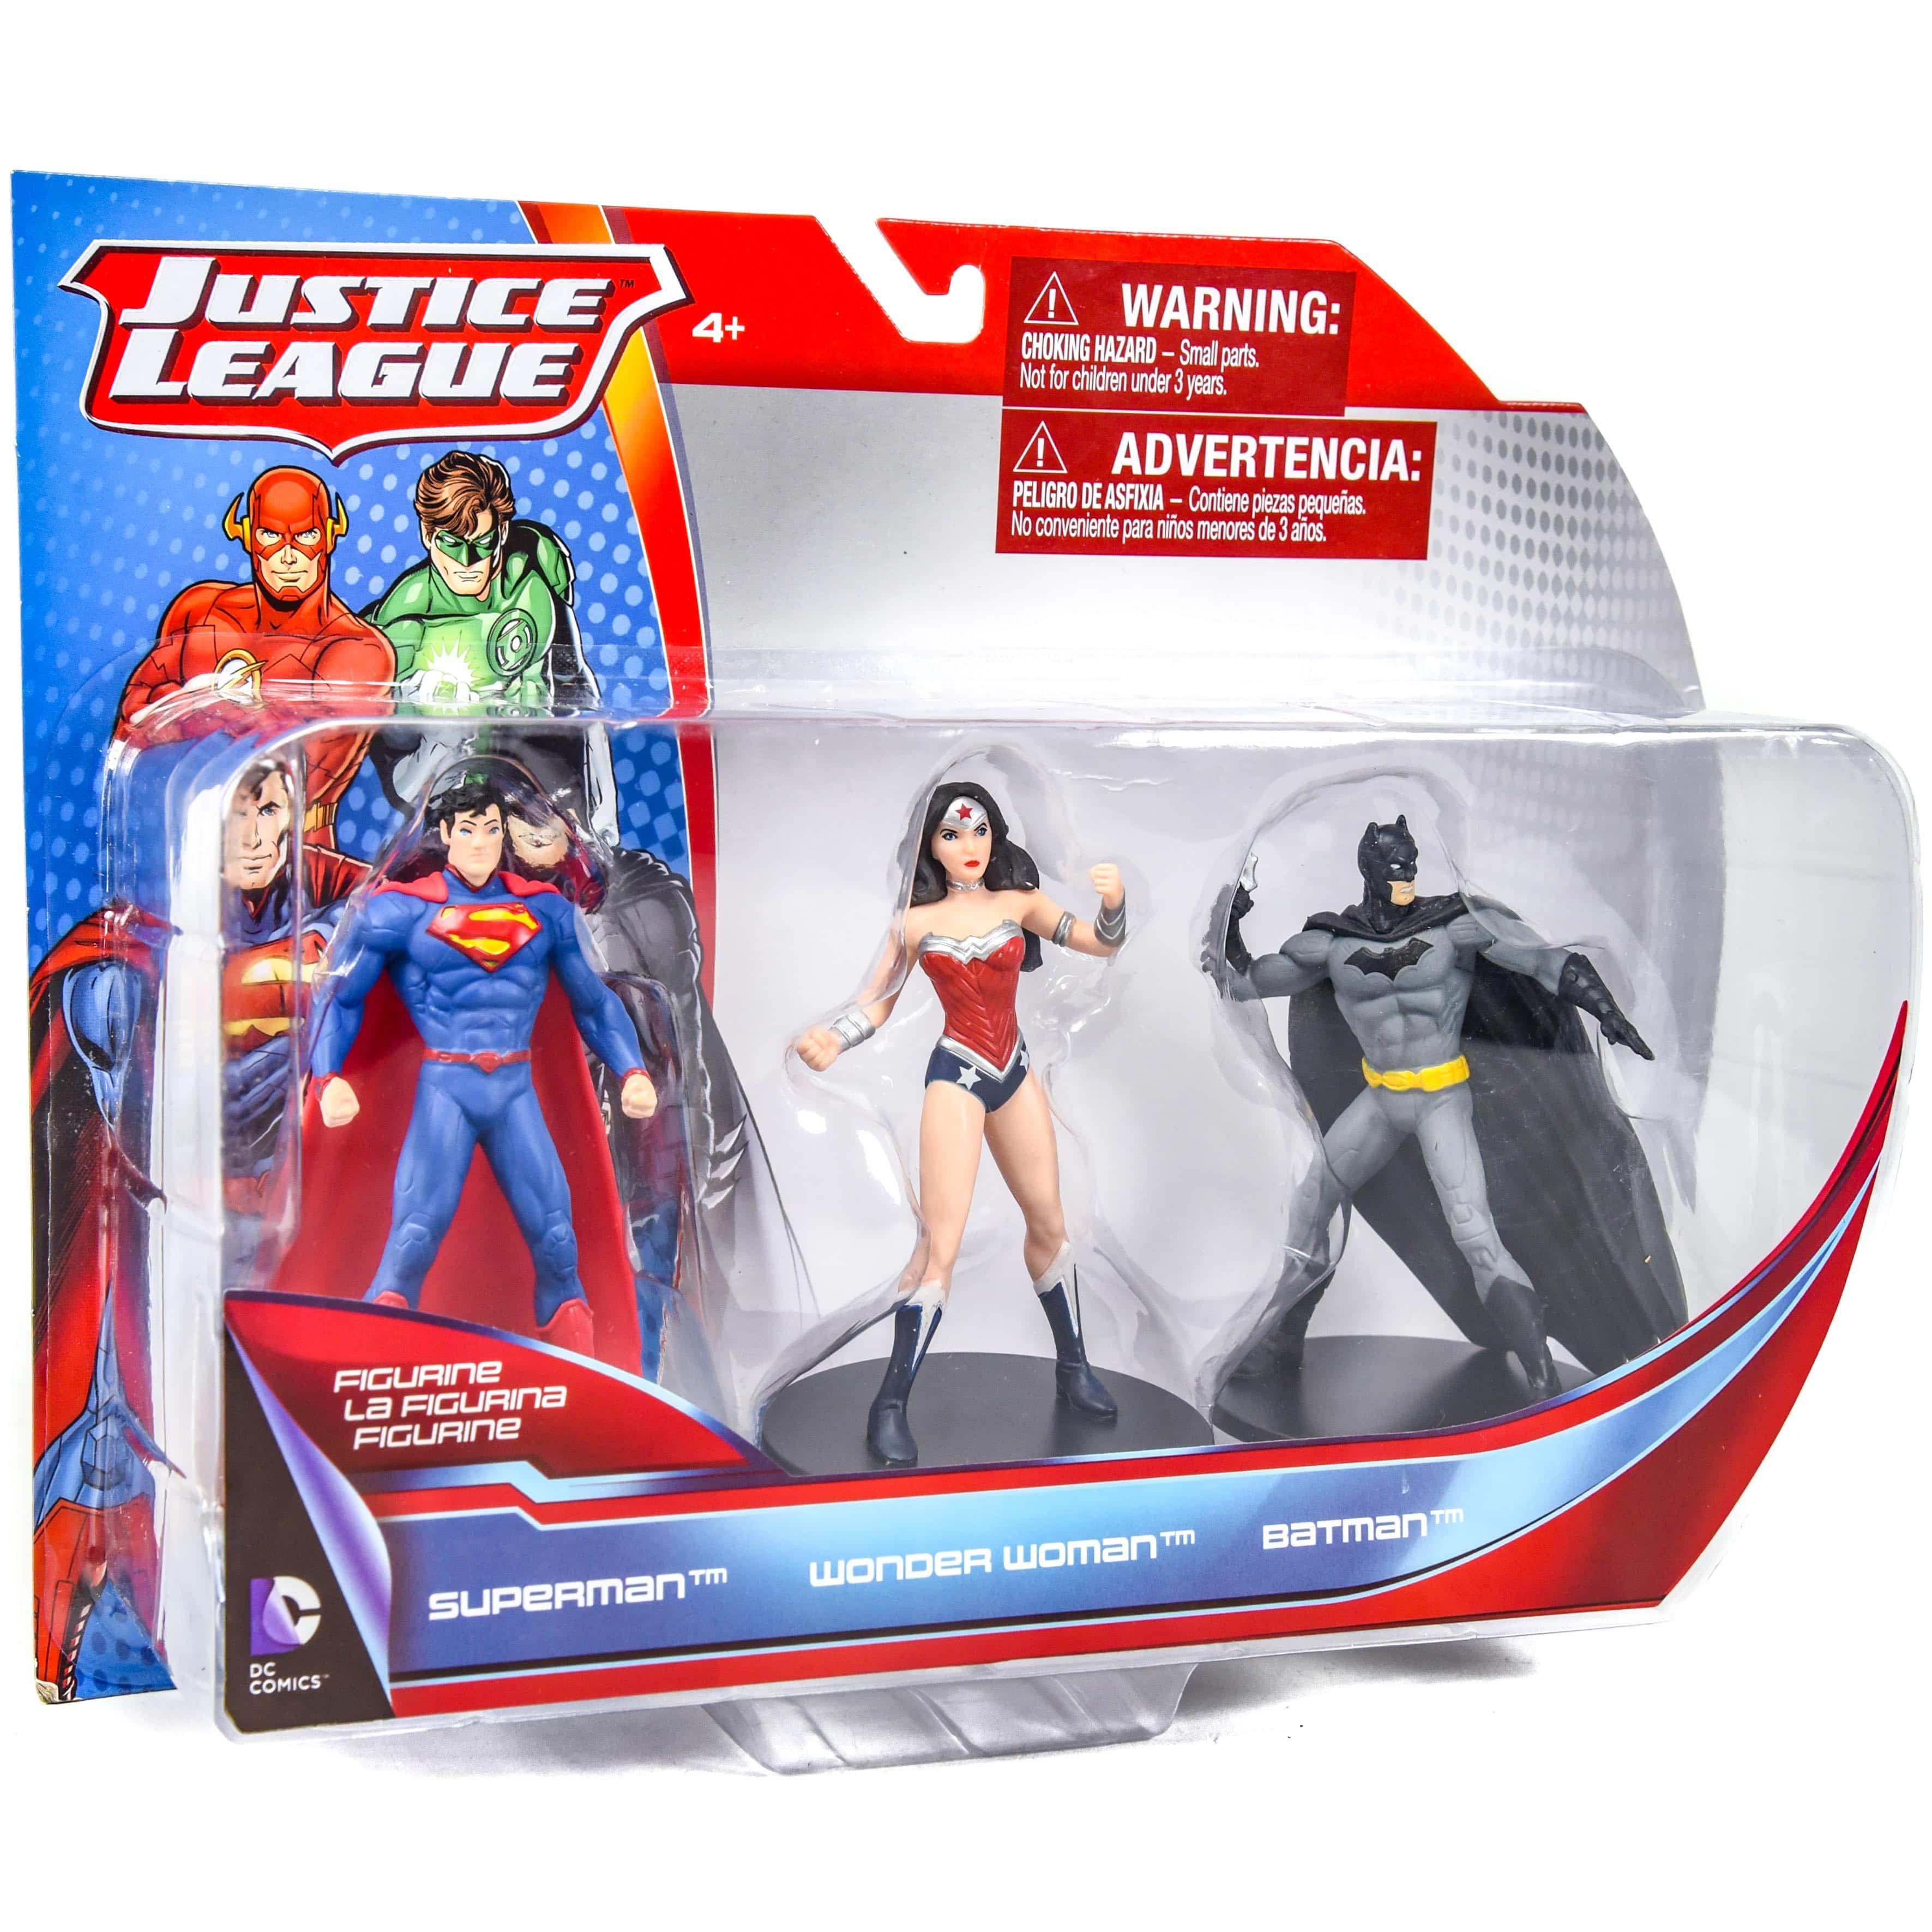 Justice League Figurine Set - Superman 1c96872bbb2